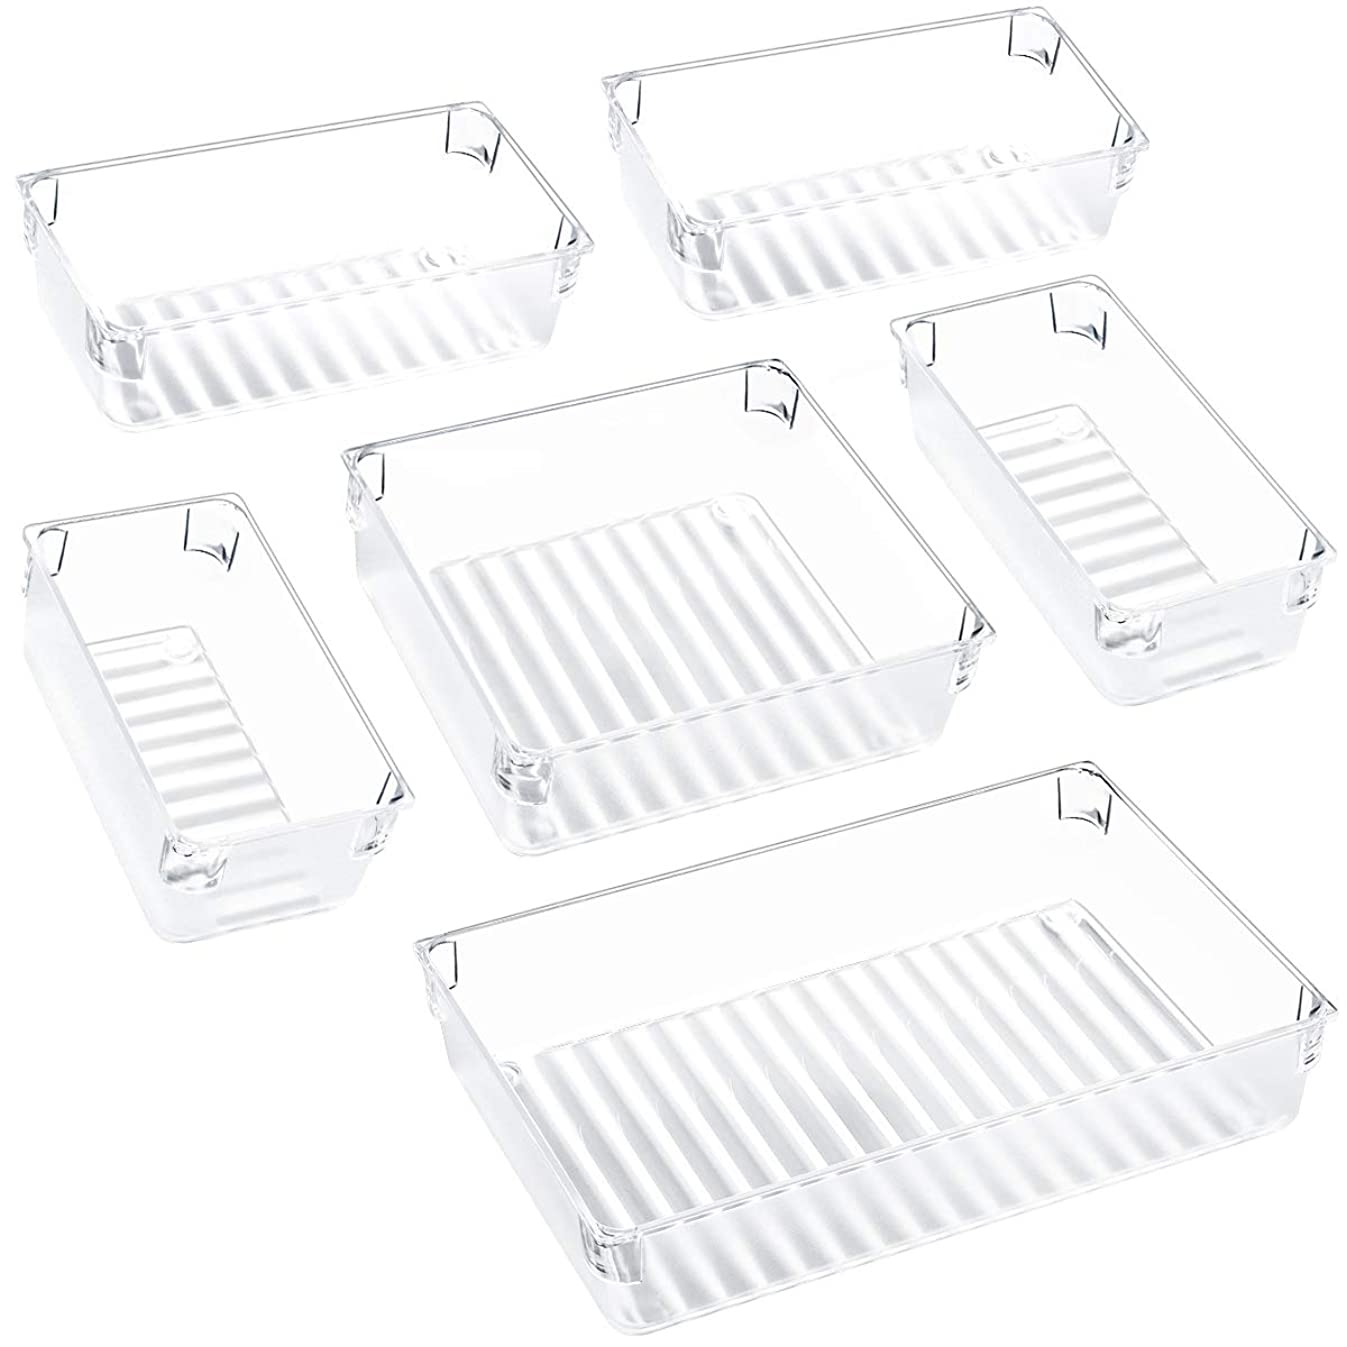 Kootek Desk Drawer Organizer Trays with 3-Size Large Capacity Storage Drawer Dividers Customize Layout 6 Bins for Bedroom Dresser Bathroom Kitchen